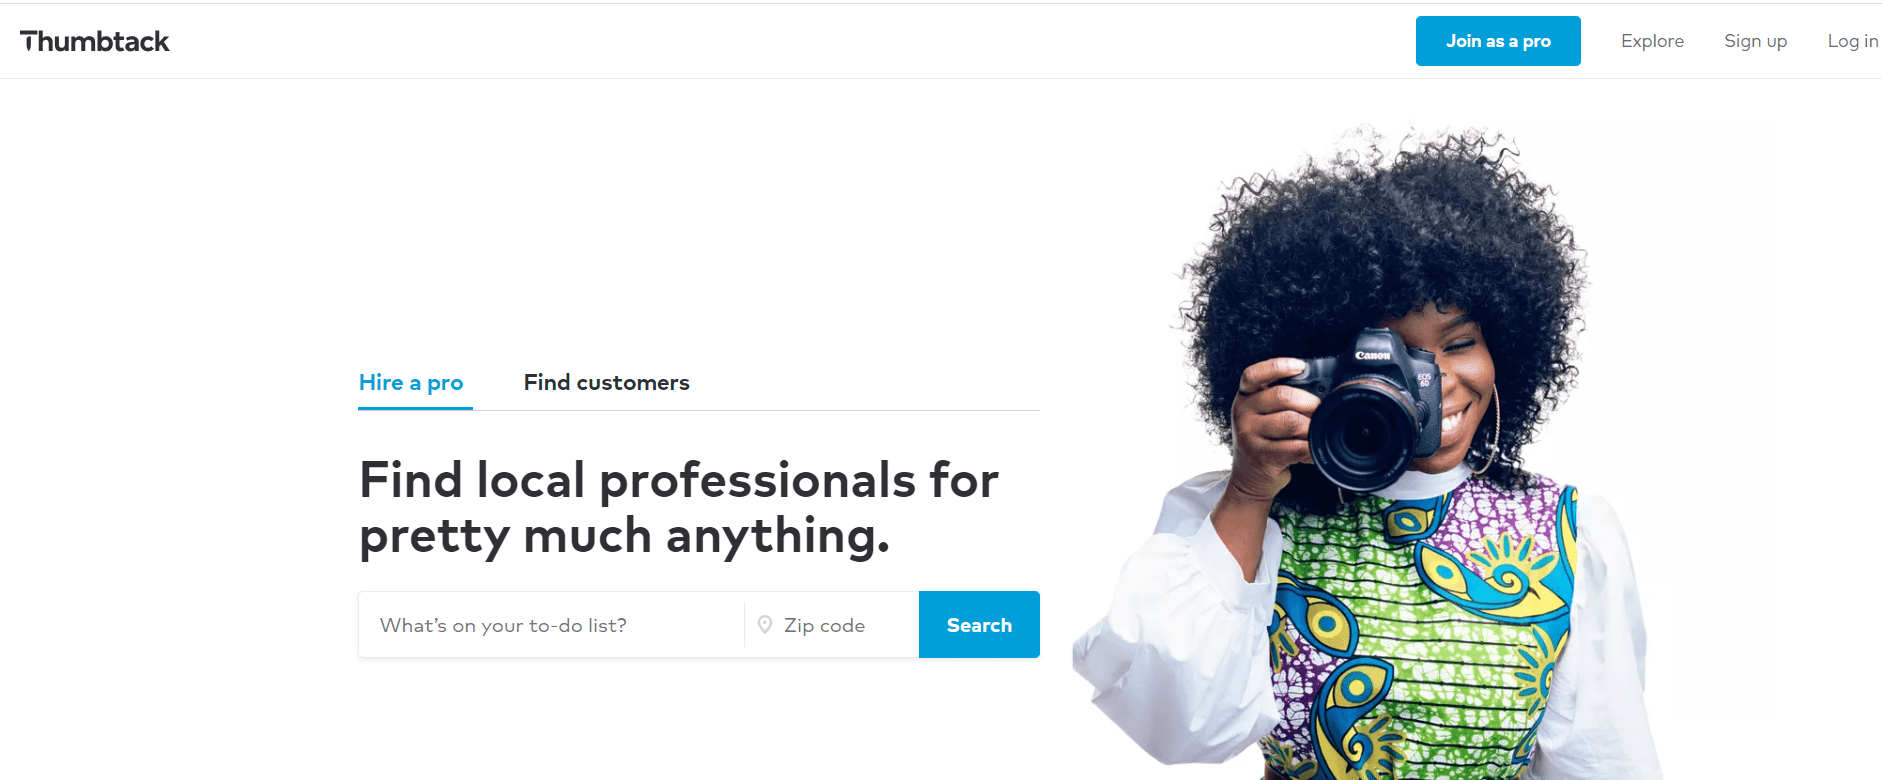 Thumbtack homepage, local professional photographer